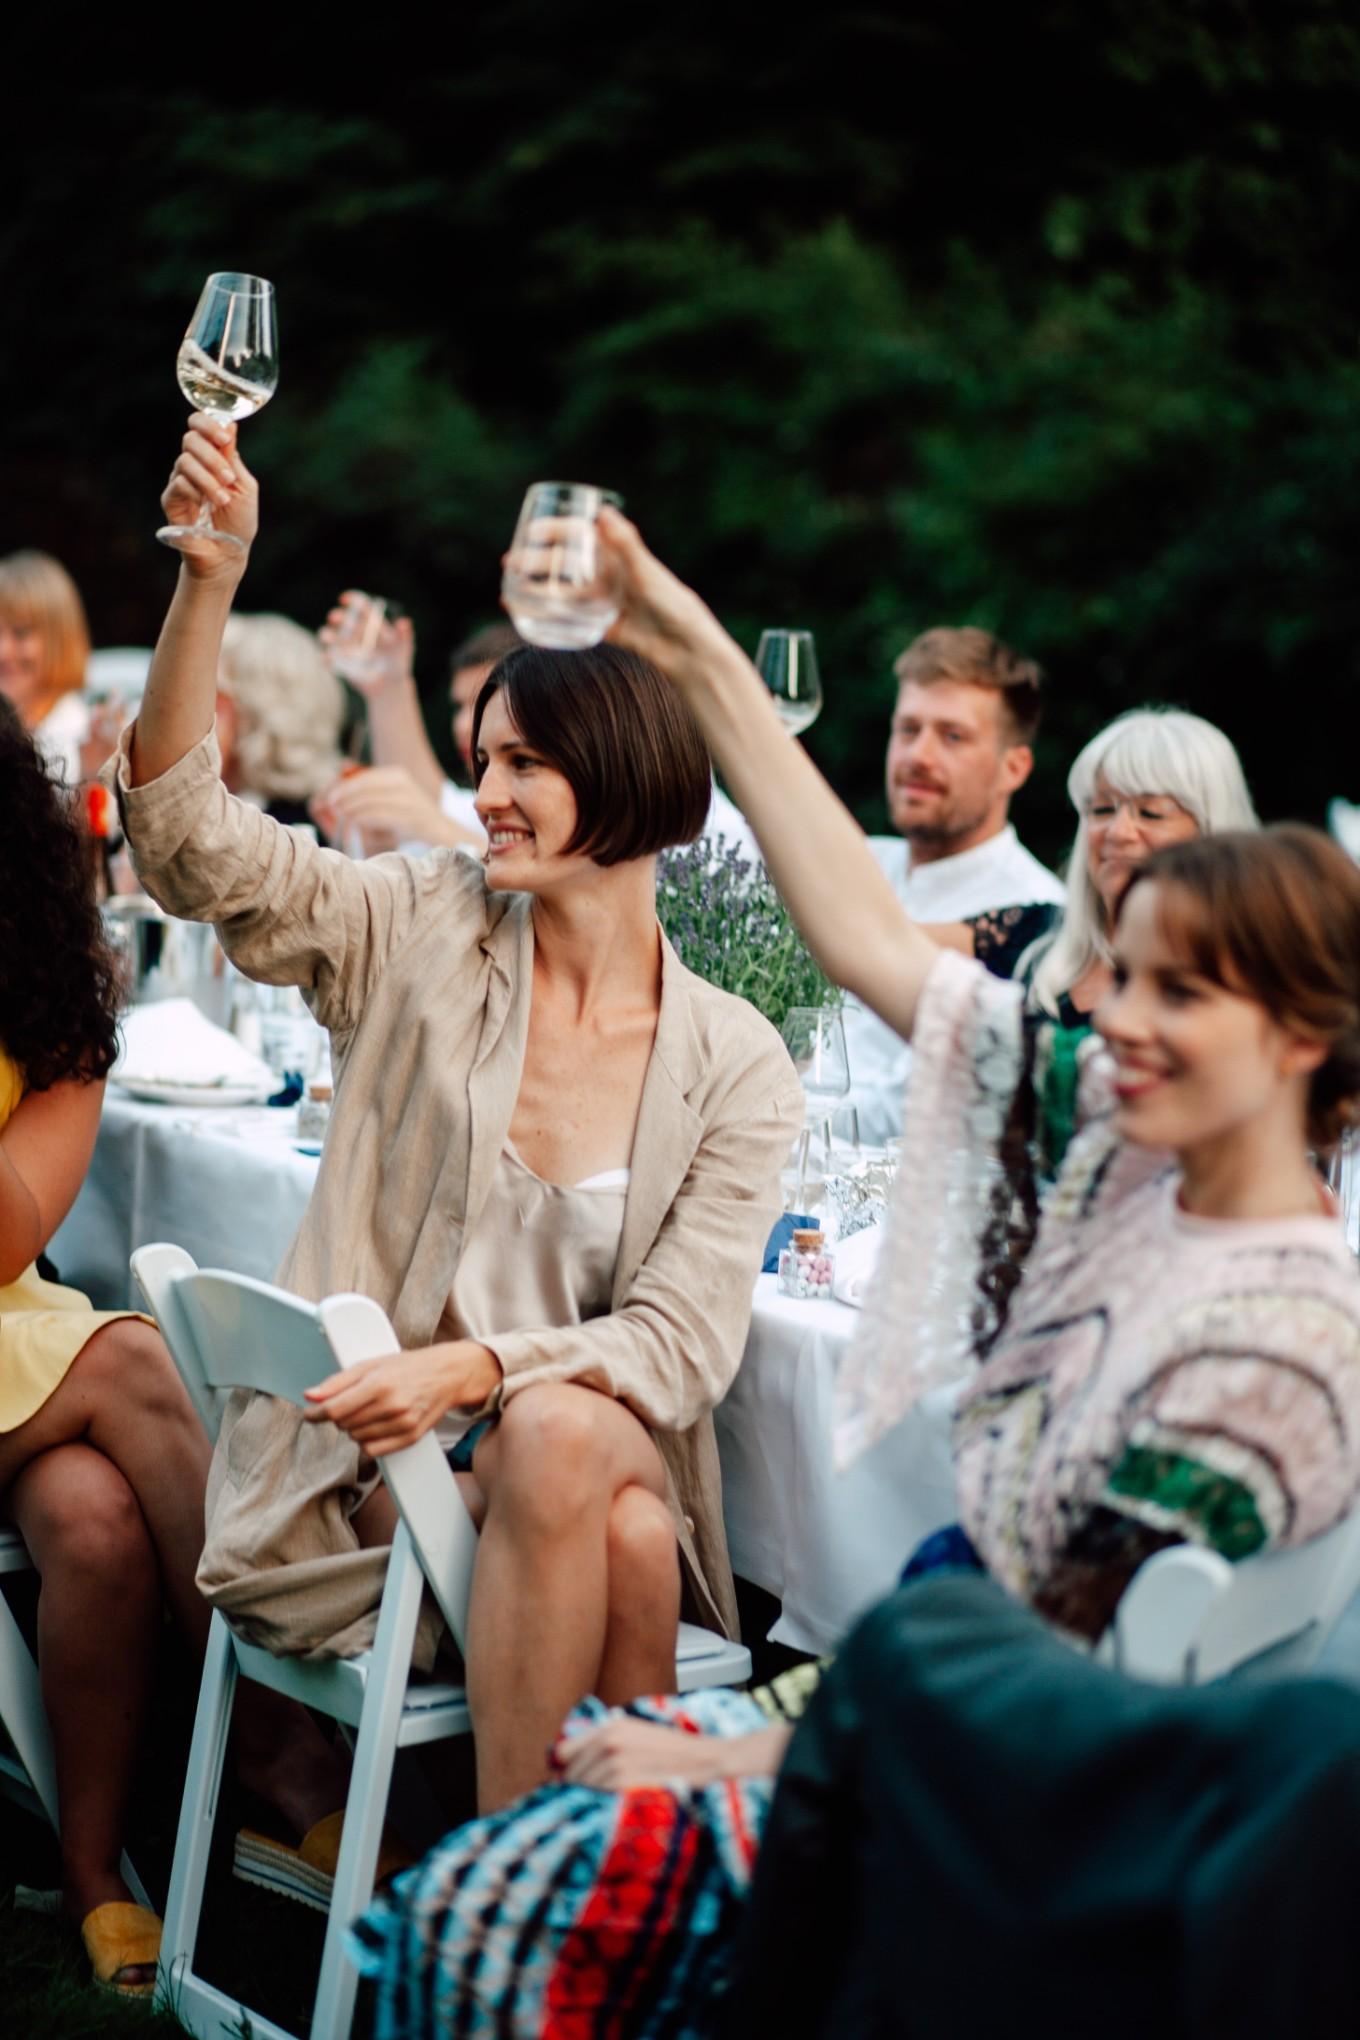 Berlin-Wannsee-Pia-Anna-Christian-Wedding-Photography-ST-77.jpg